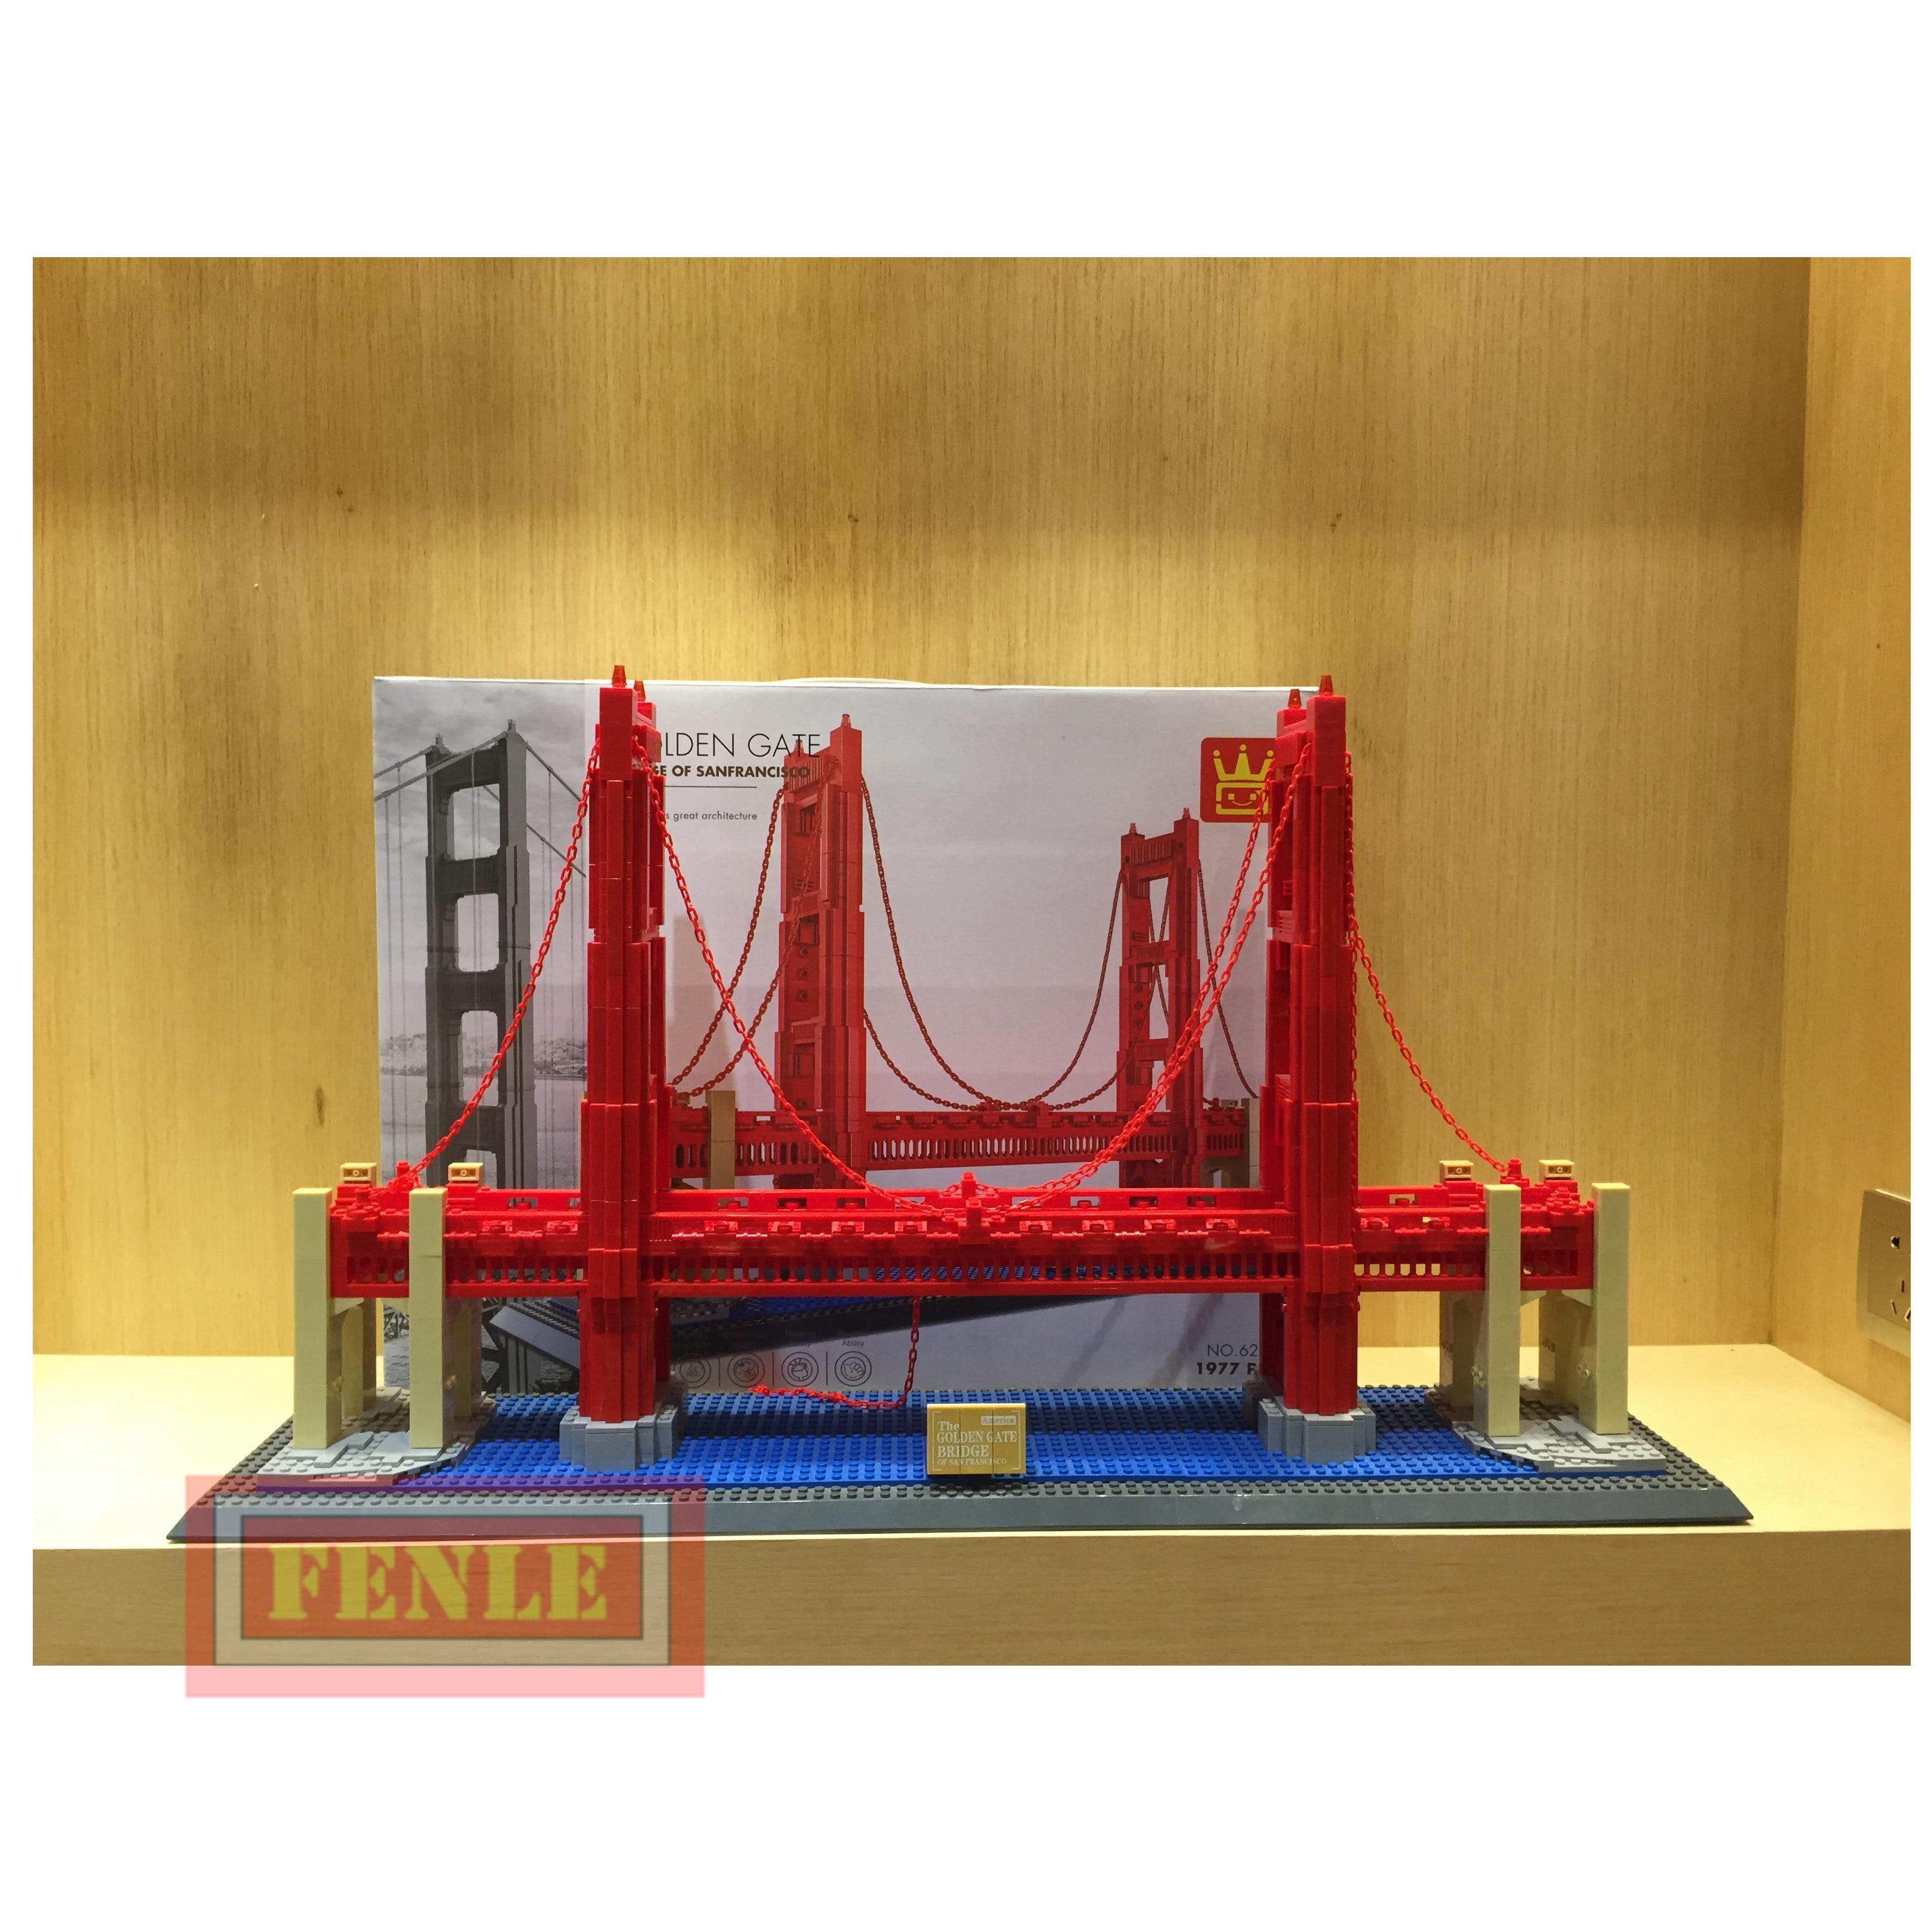 8023 6210 Famous Building Series Golden Gate Bridge 1977Pcs Building Blocks Bricks Model Sets Compatible Architecture-in Blocks from Toys & Hobbies    1